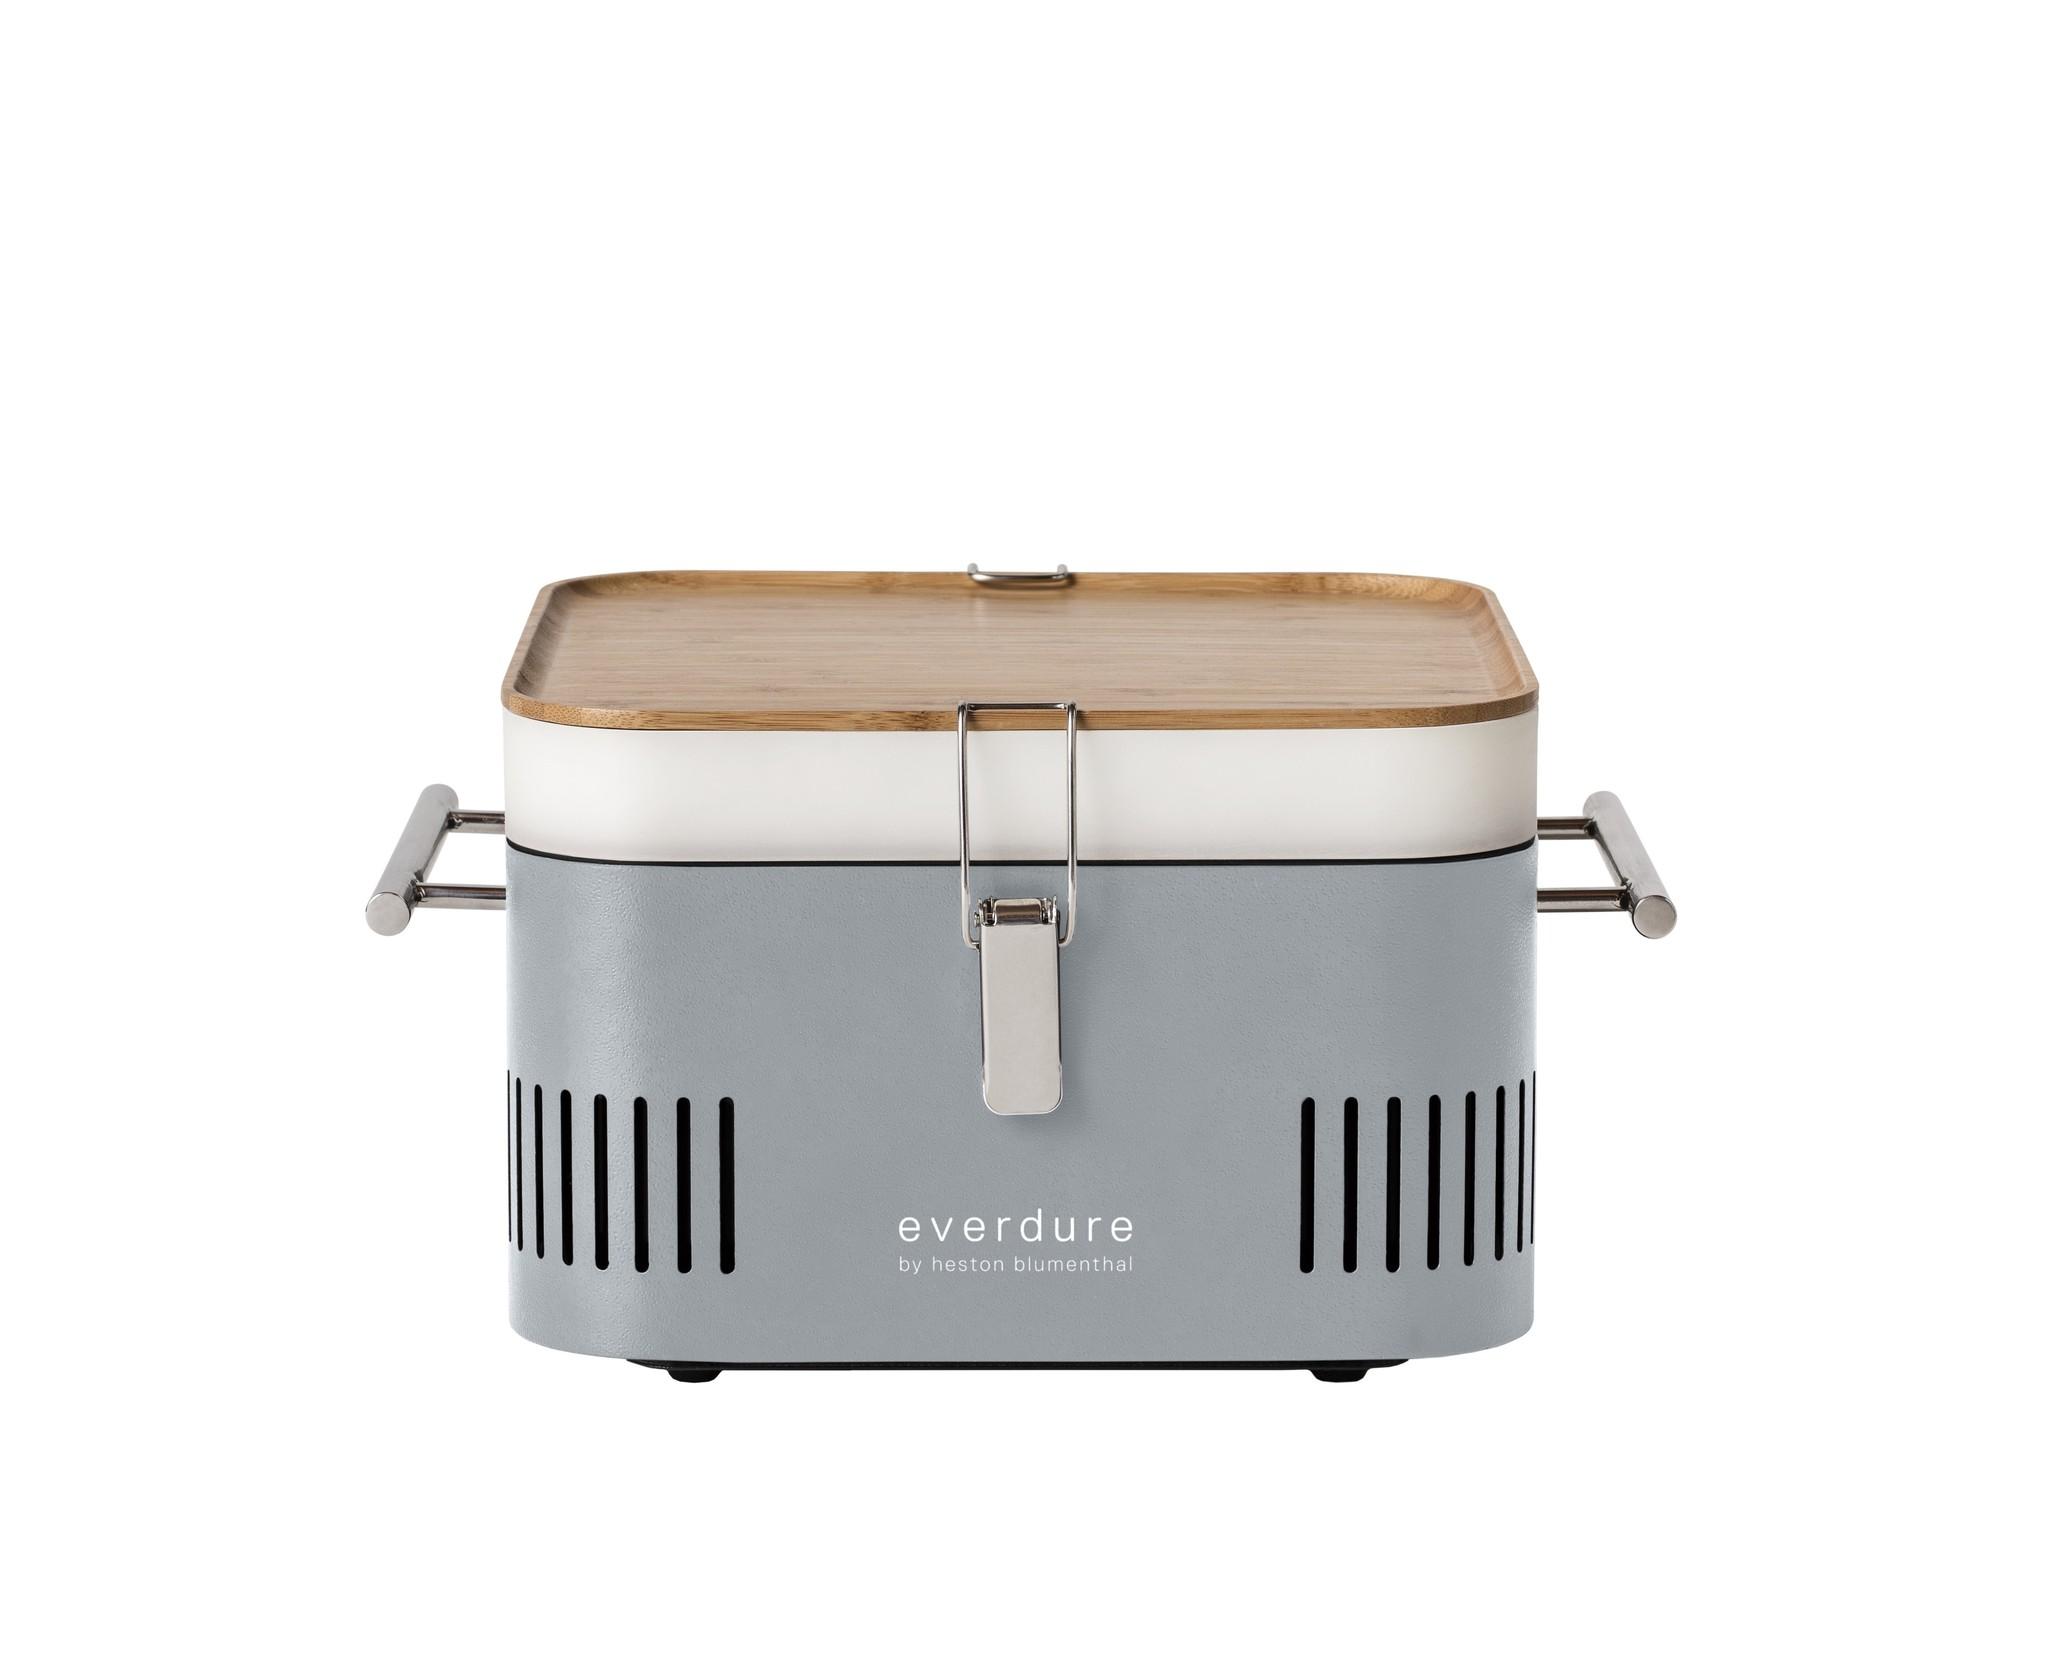 Everdure Cube grijs houtskoolbarbecue